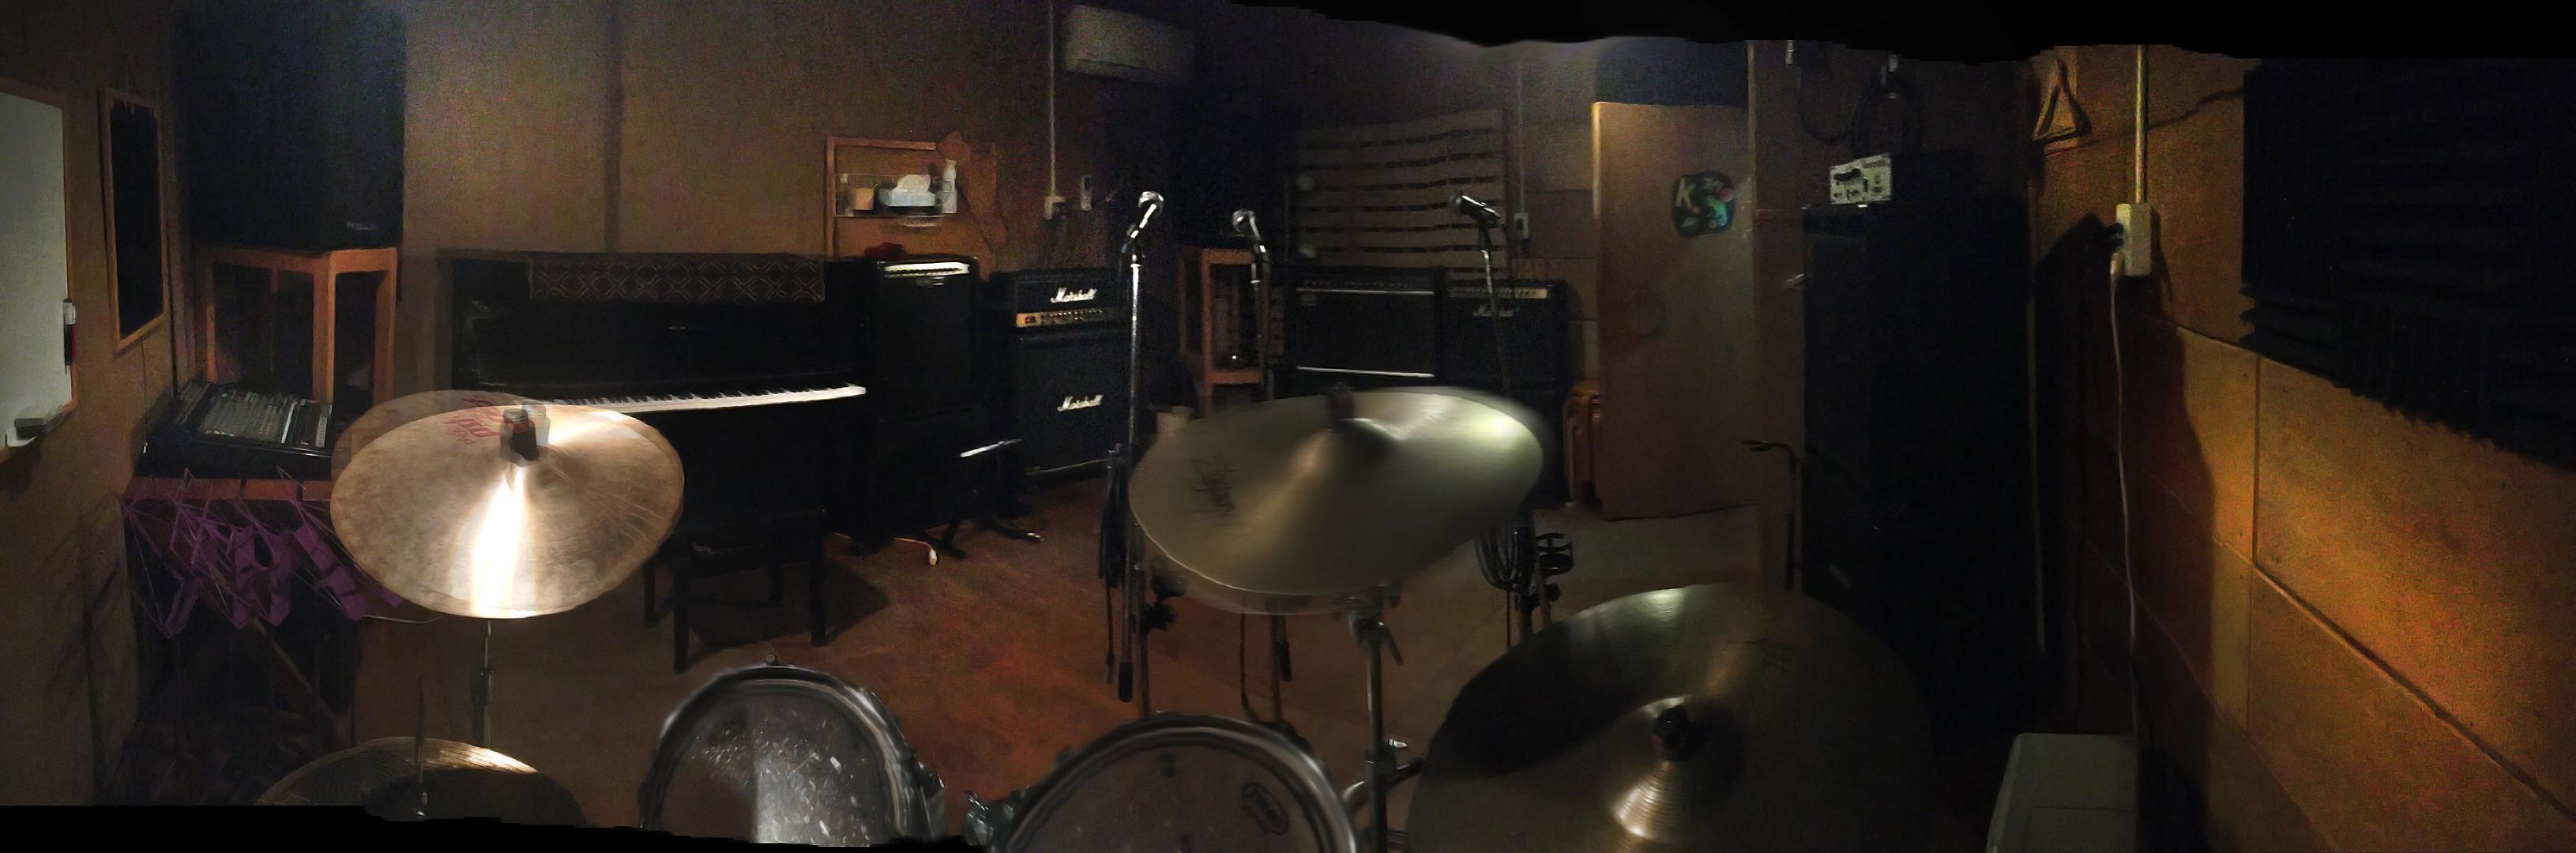 Kスタジオ